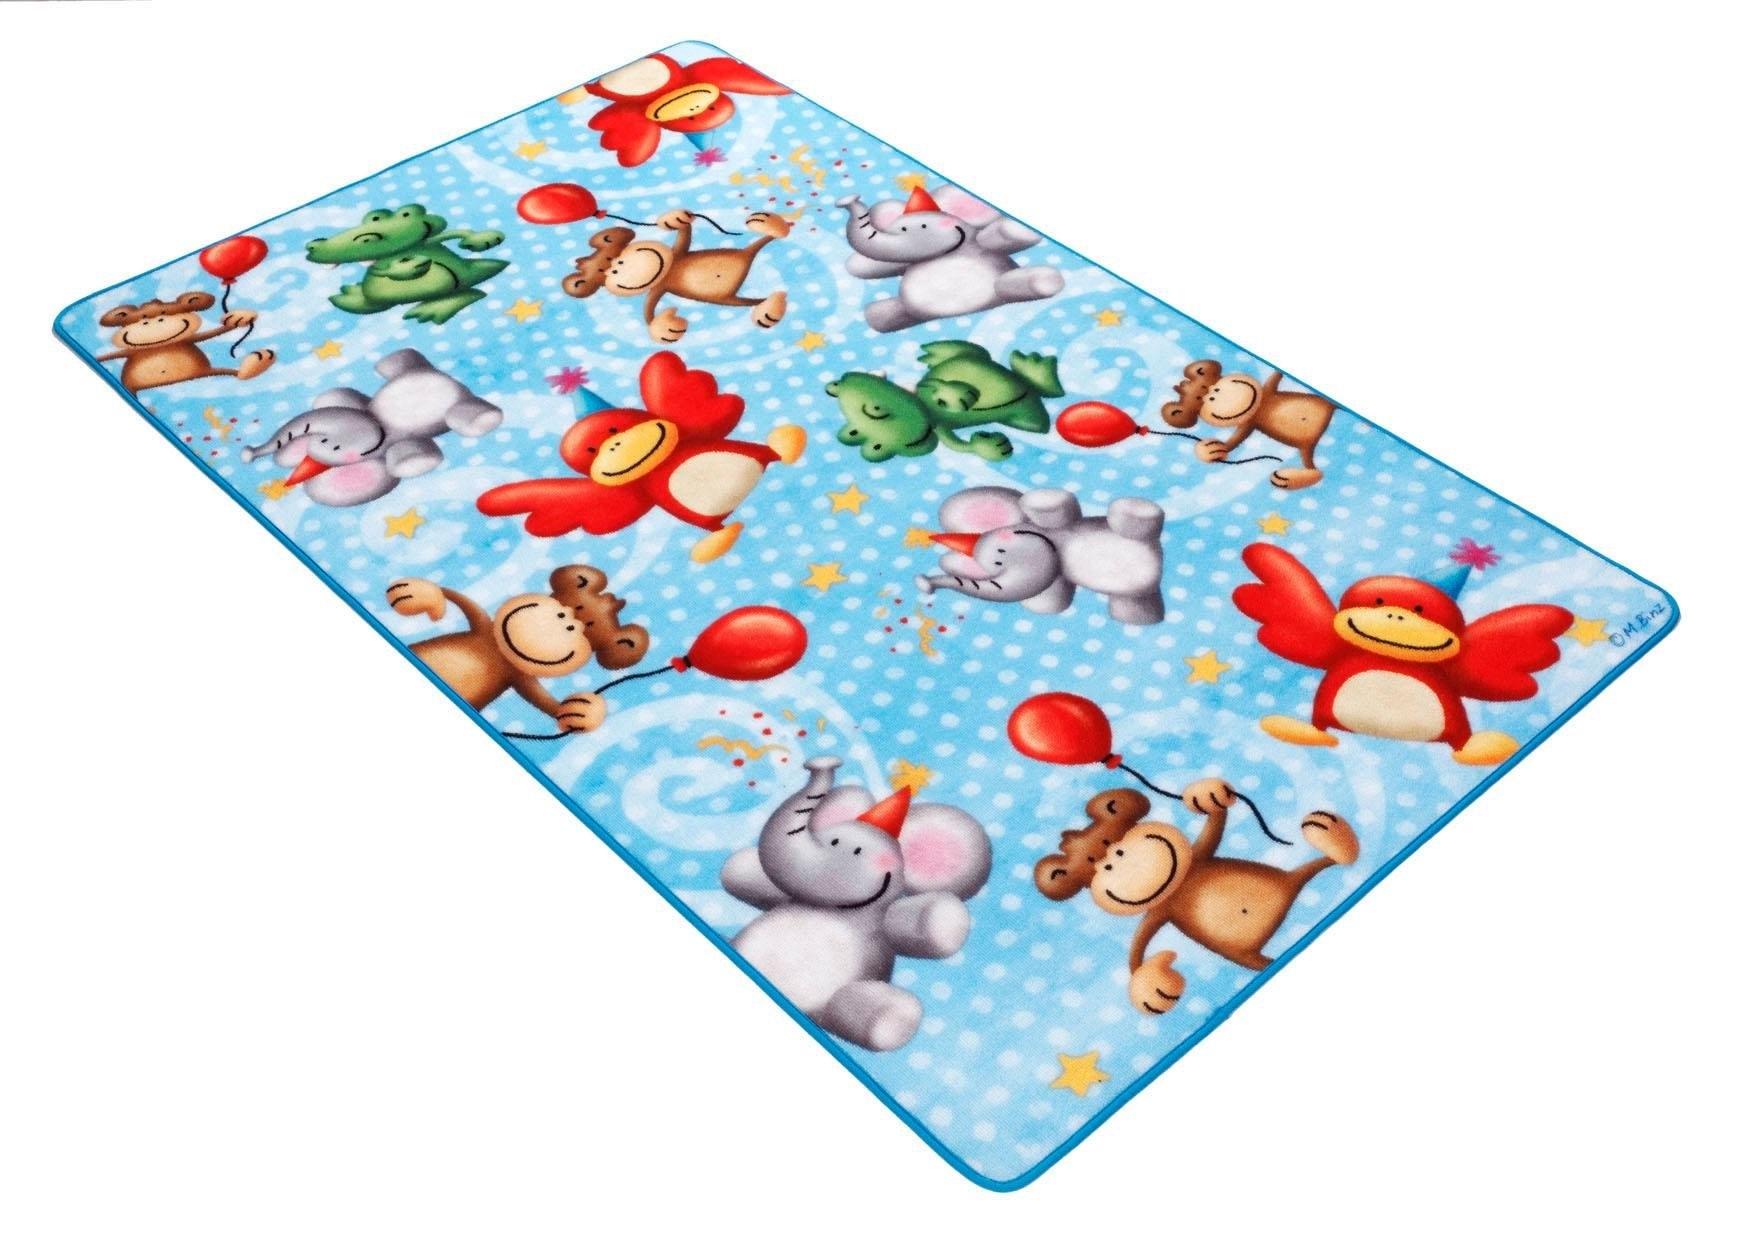 Böing Carpet Mat Lovely Kids LK-4 in de webshop van OTTO kopen